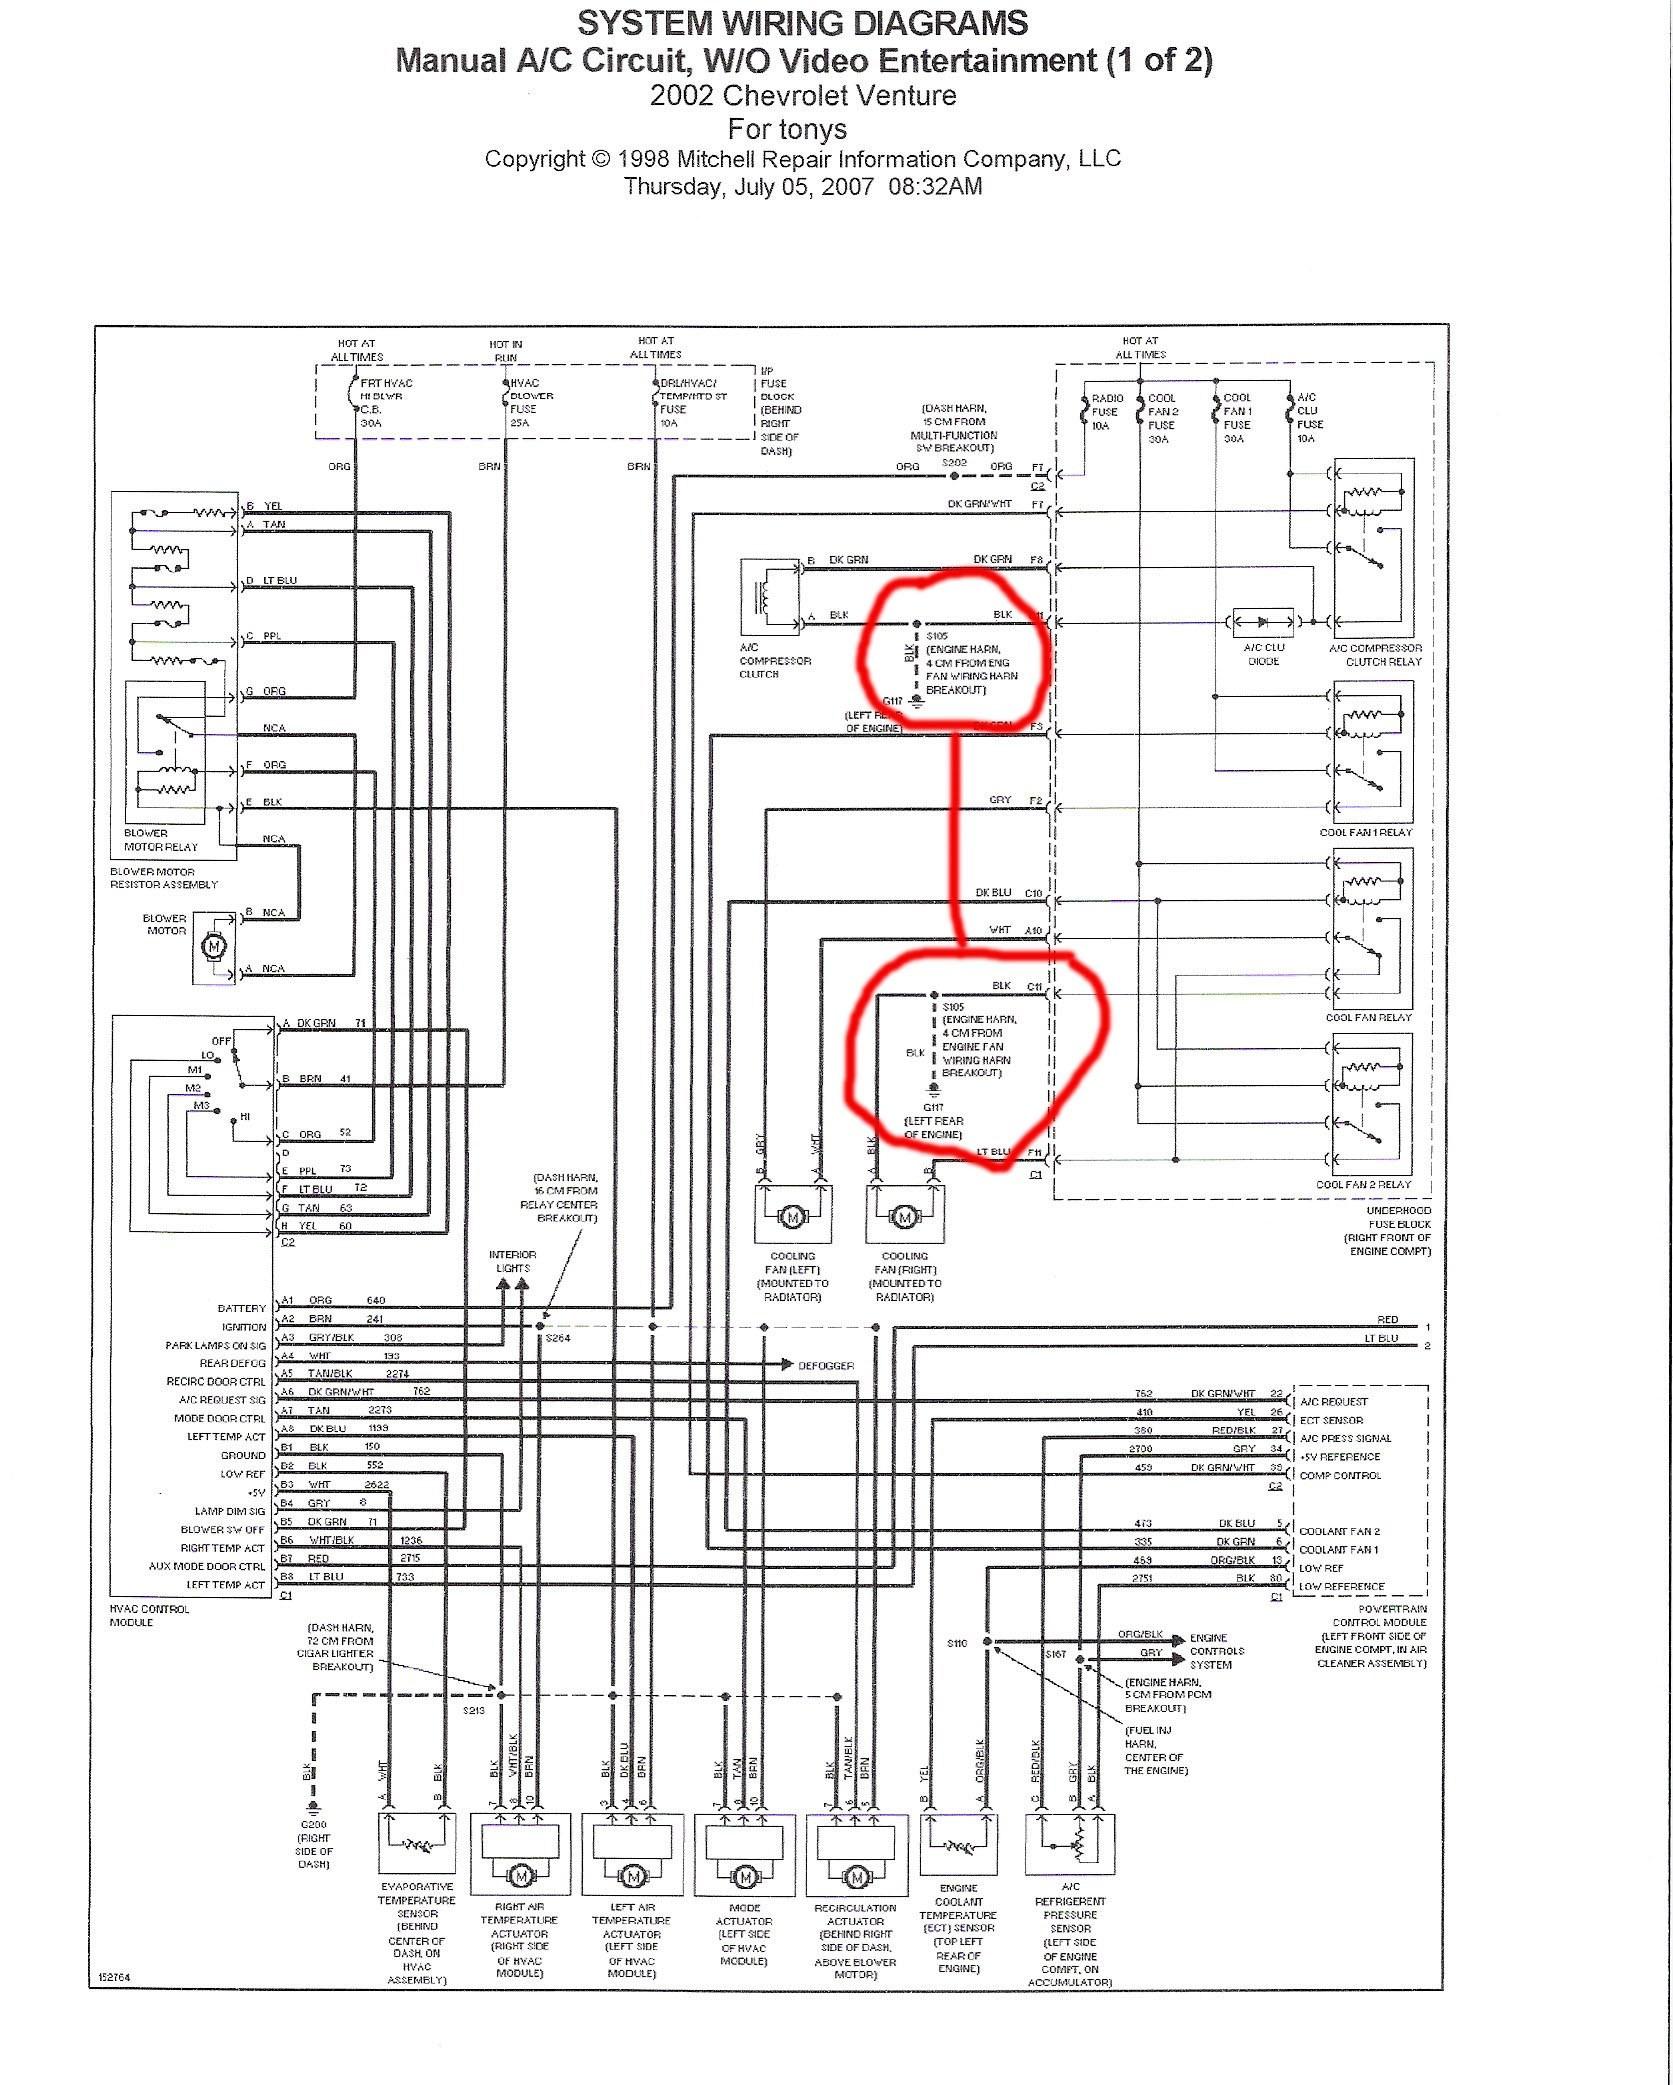 Pyle Hydra Wiring Diagram